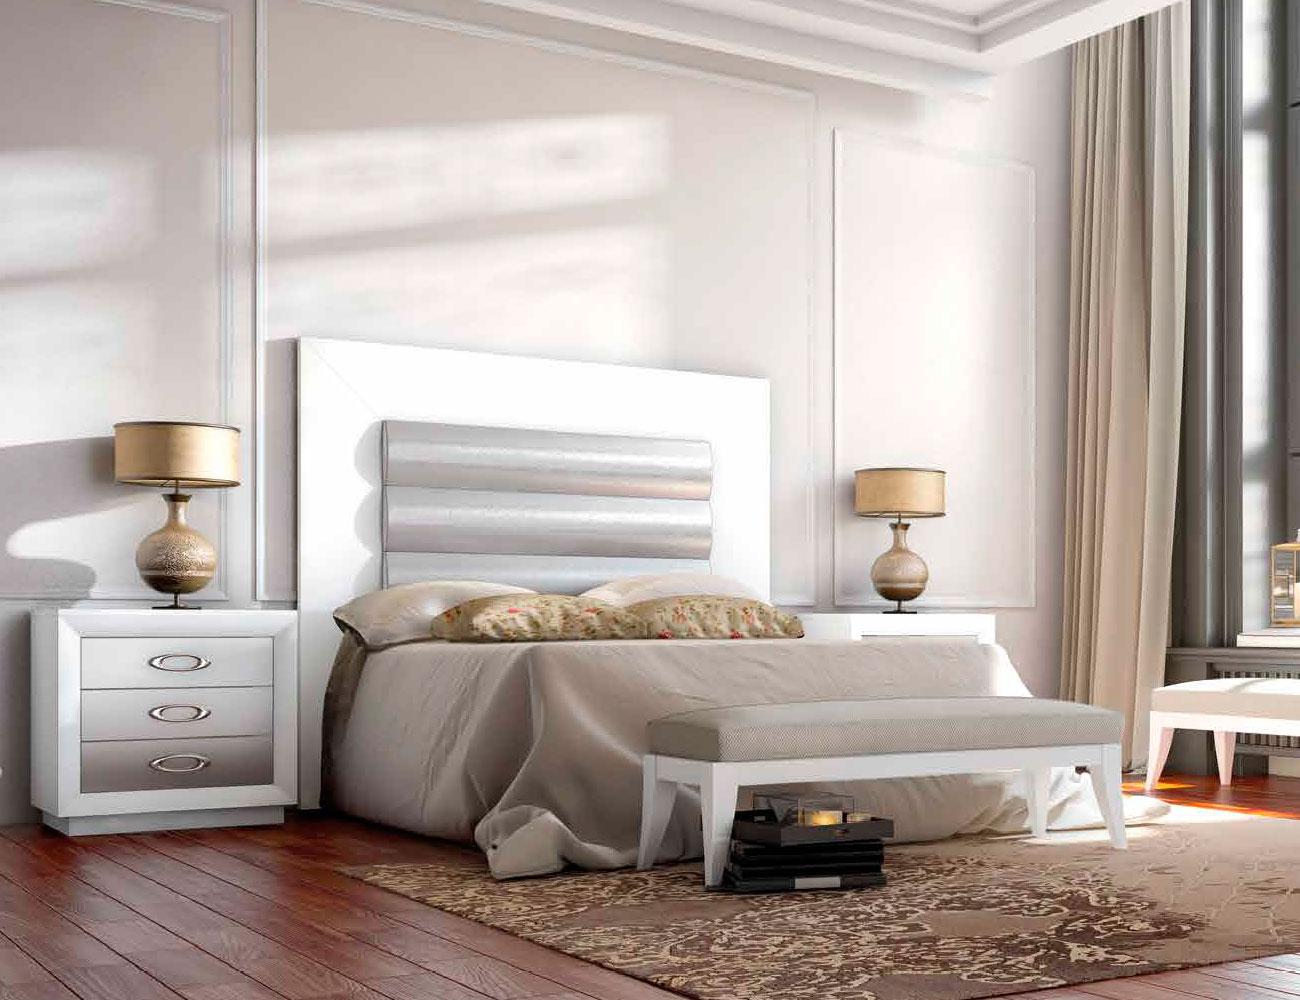 Dormitorio matrimonio neoclasico cabecero tapizado blanco